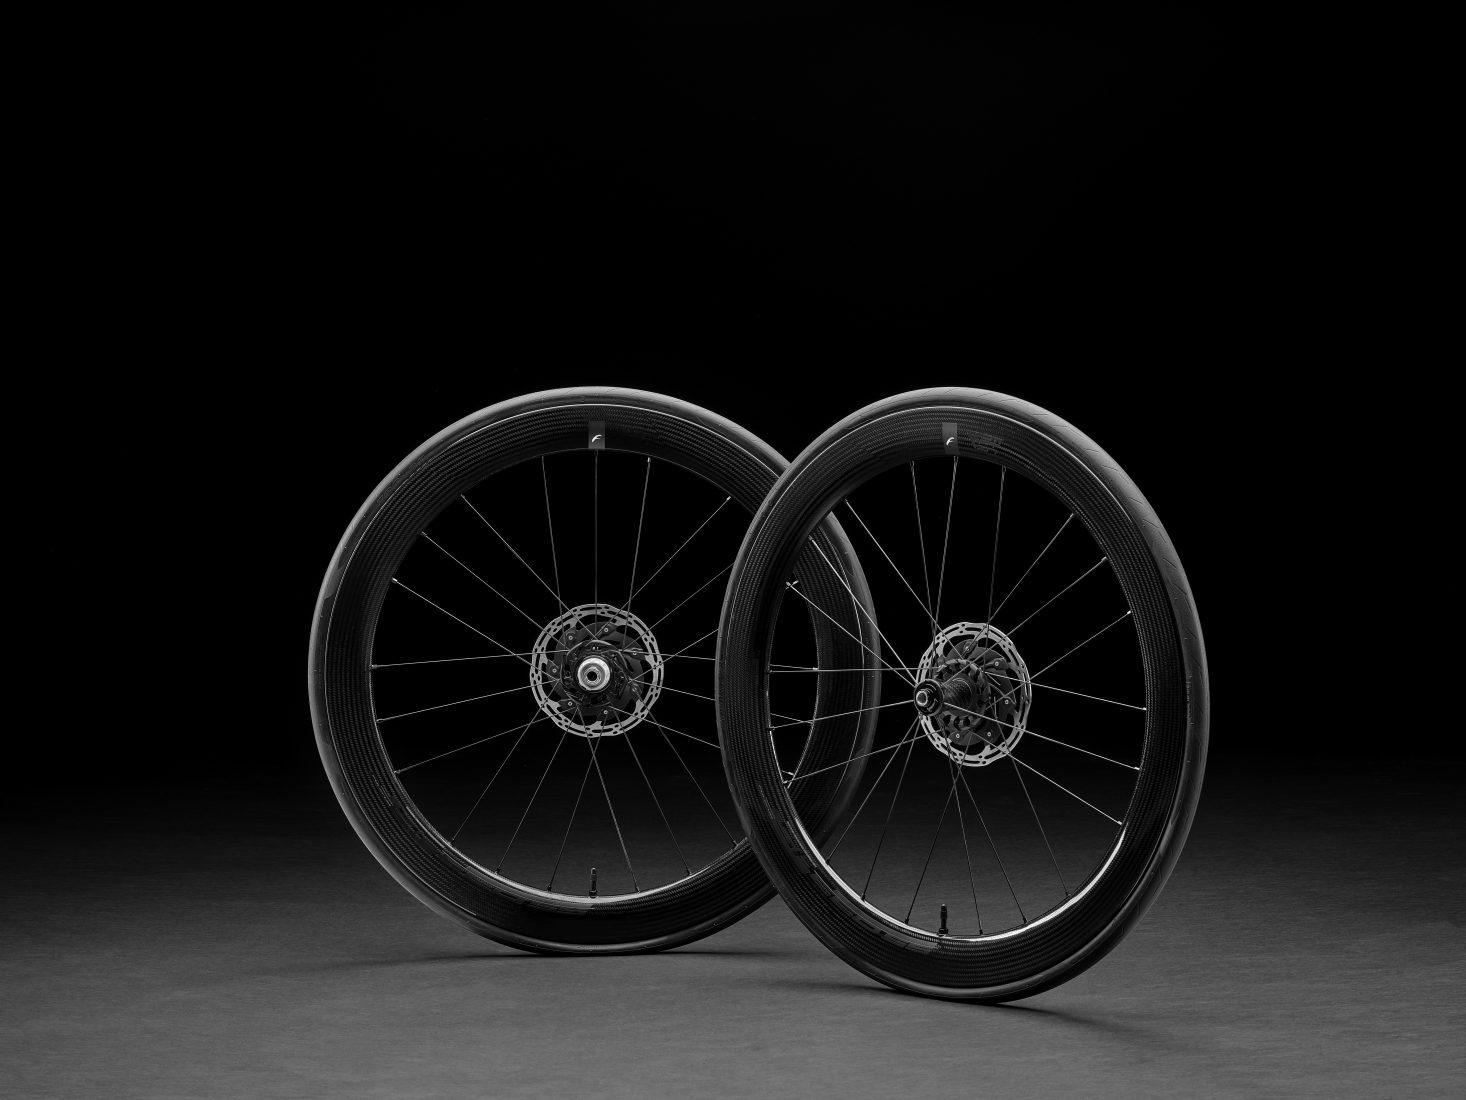 Nuove ruote Fulcrum Speed 40 / Speed 55 CMPTZN DB